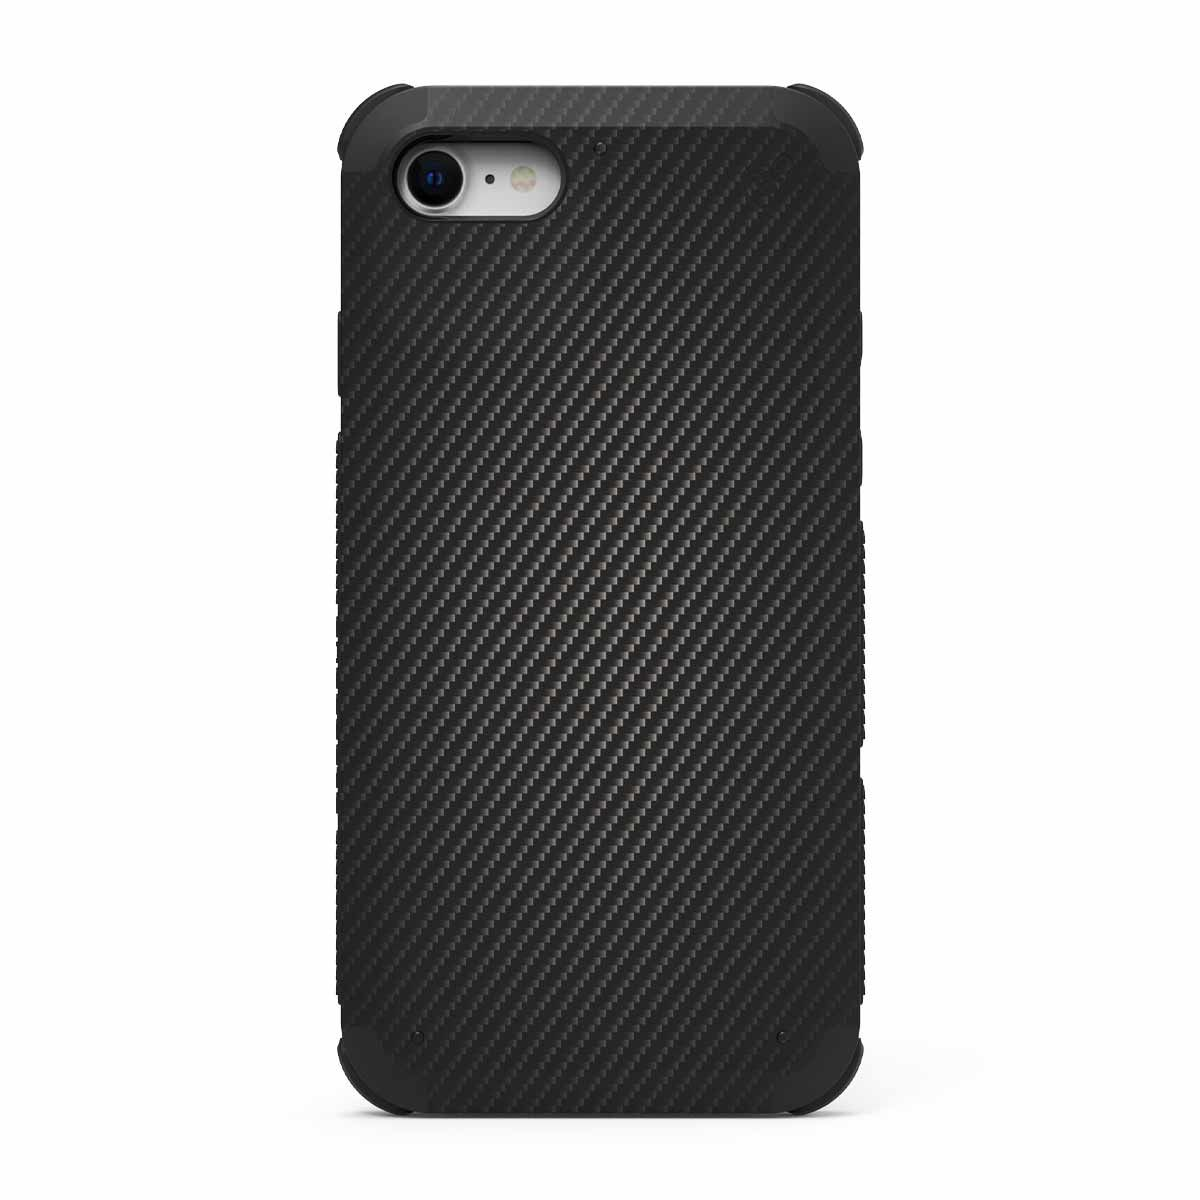 Apple iPhone SE (2020) / 8 / 7 DualTek - Carbon Fiber